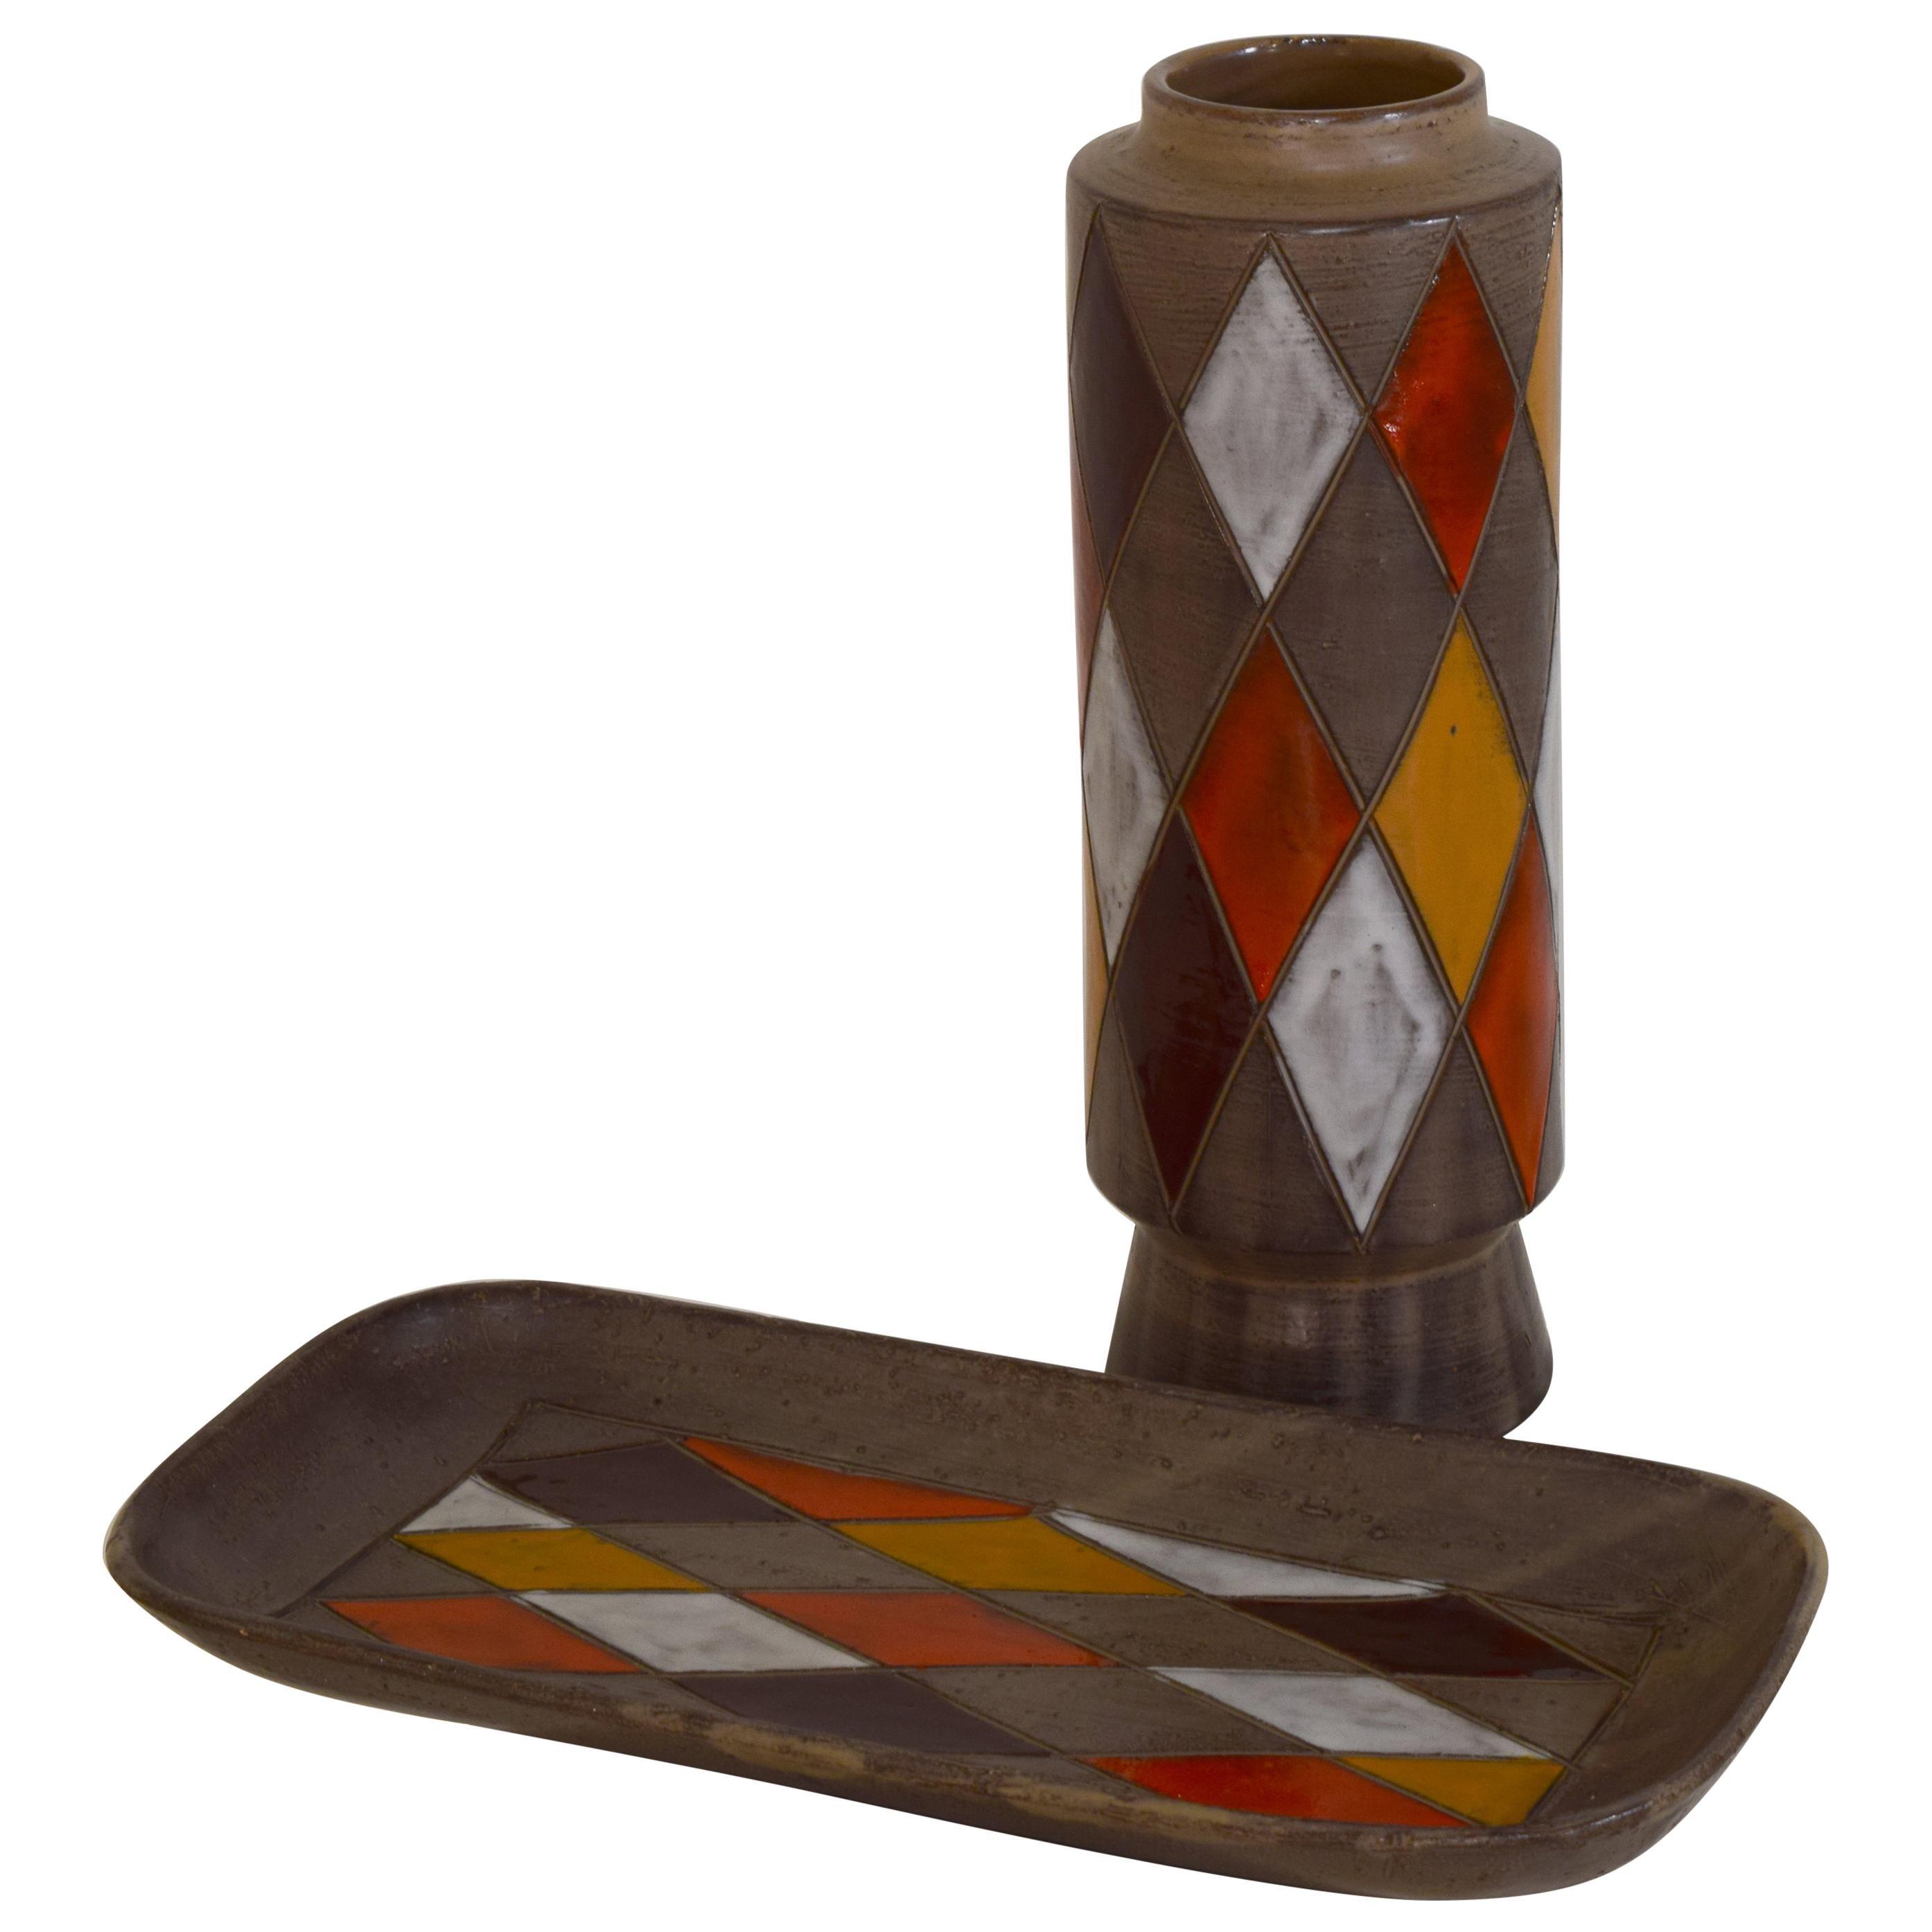 Original Bitossi 1960s set of pottery